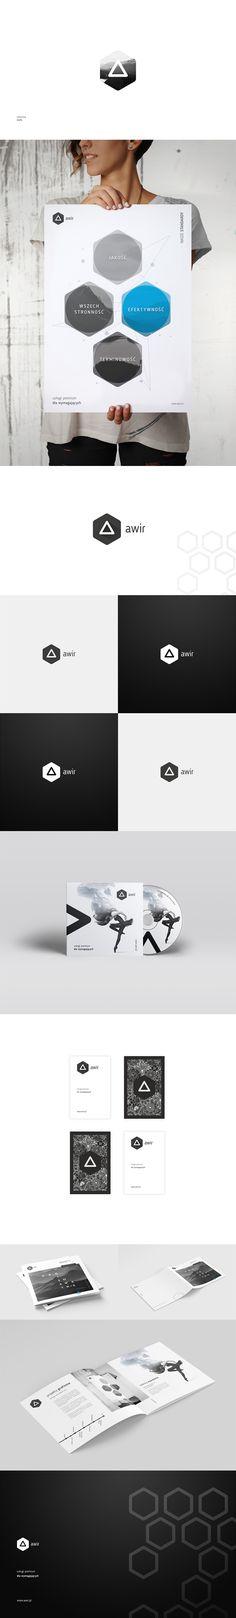 Rebrending of advertisng agency, new logo etc